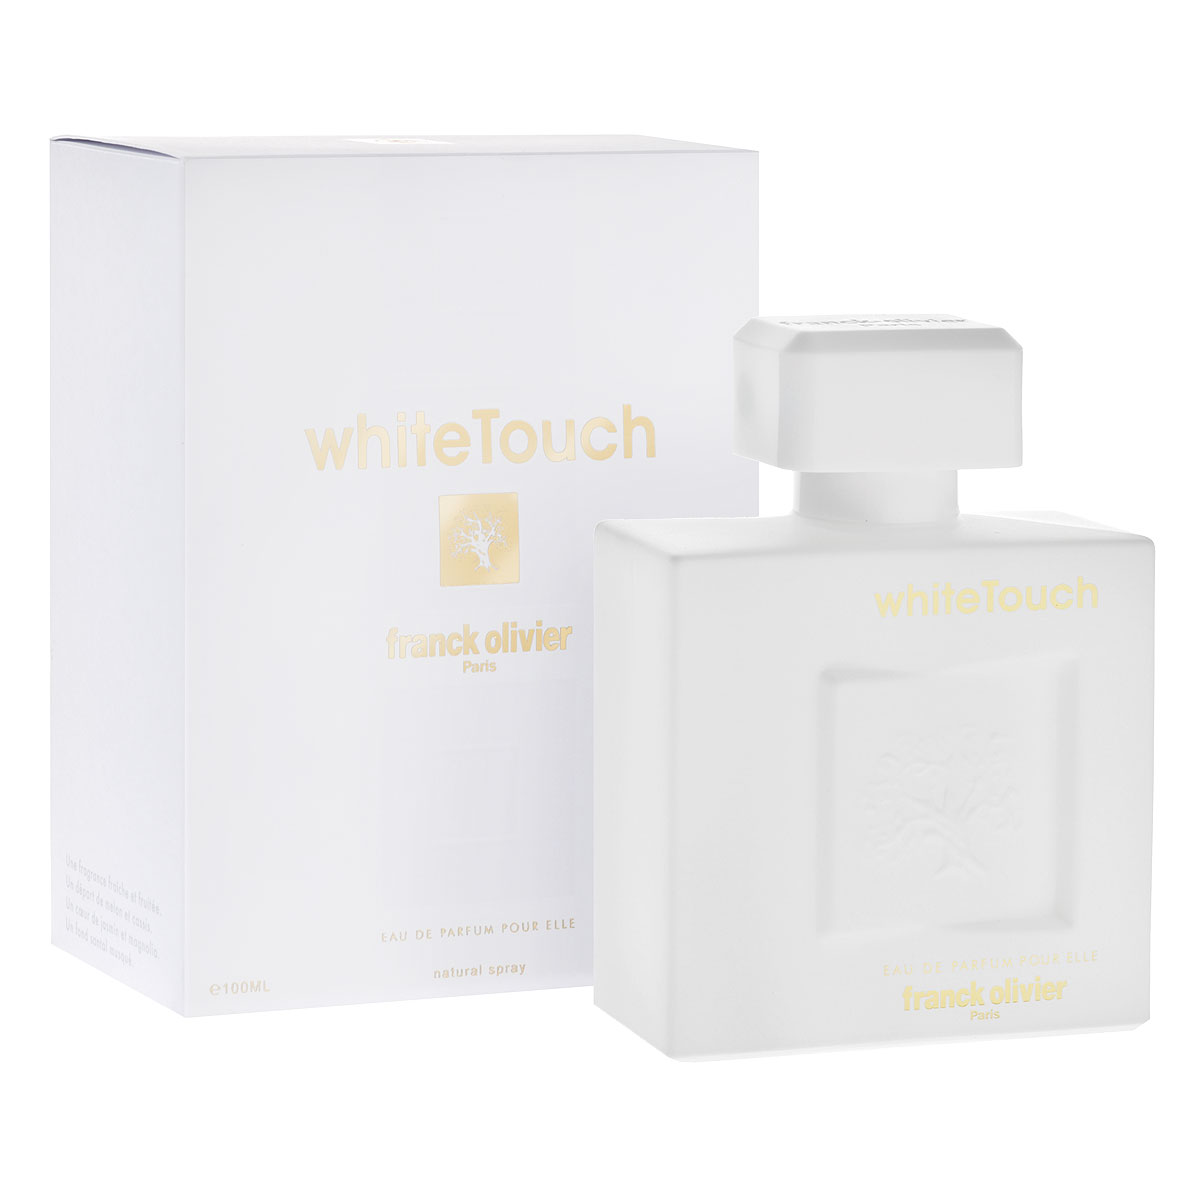 Franck Olivier Парфюмерная вода White Touch, женская, 100 мл franck olivier bamboo woman